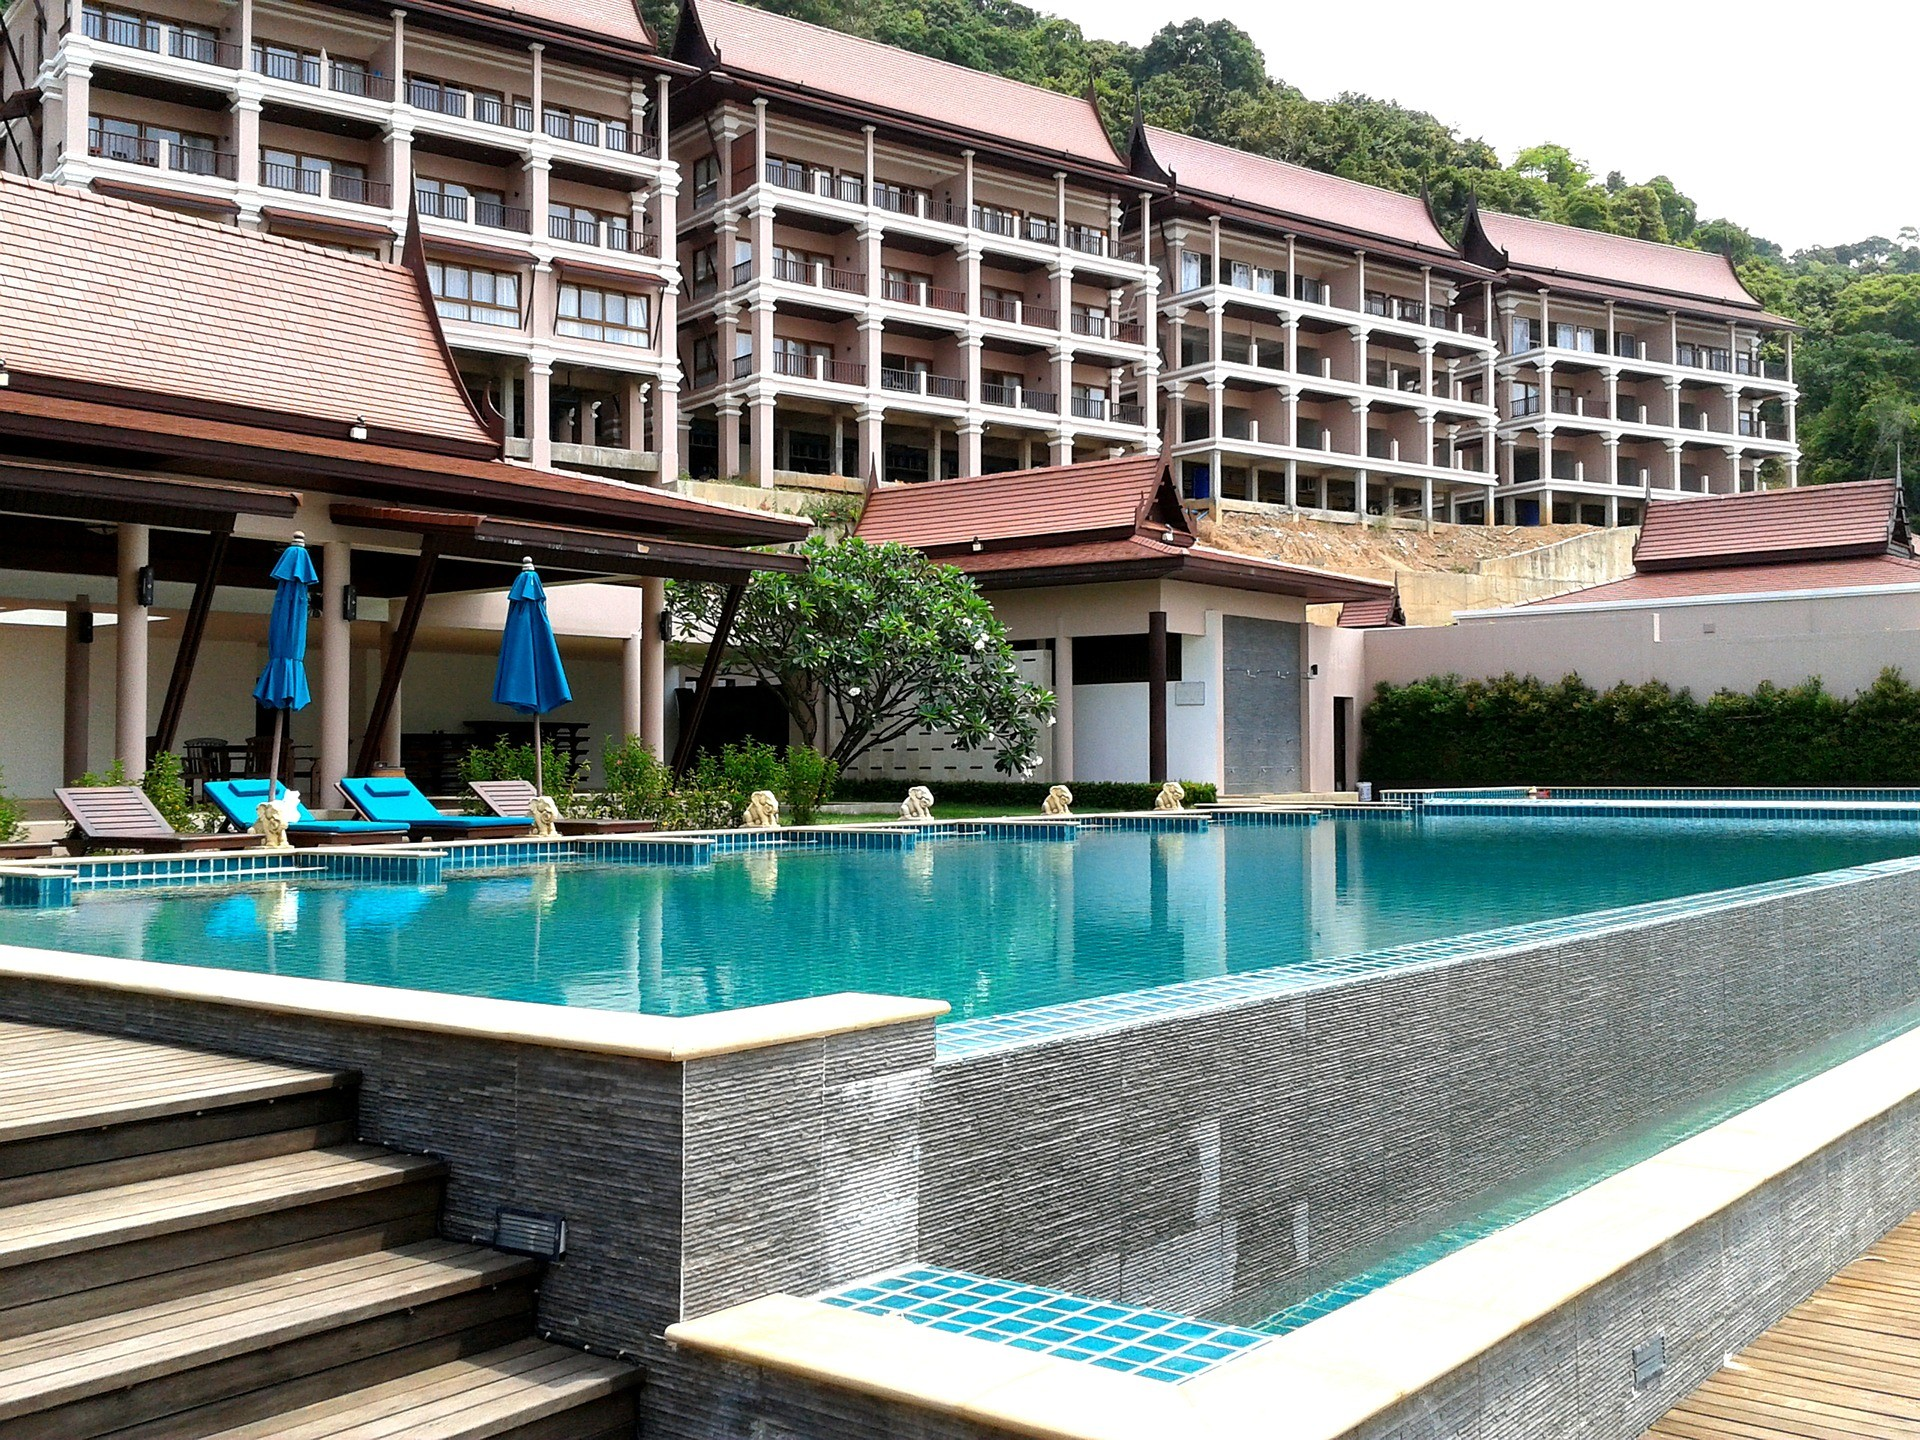 hotel-538766_1920